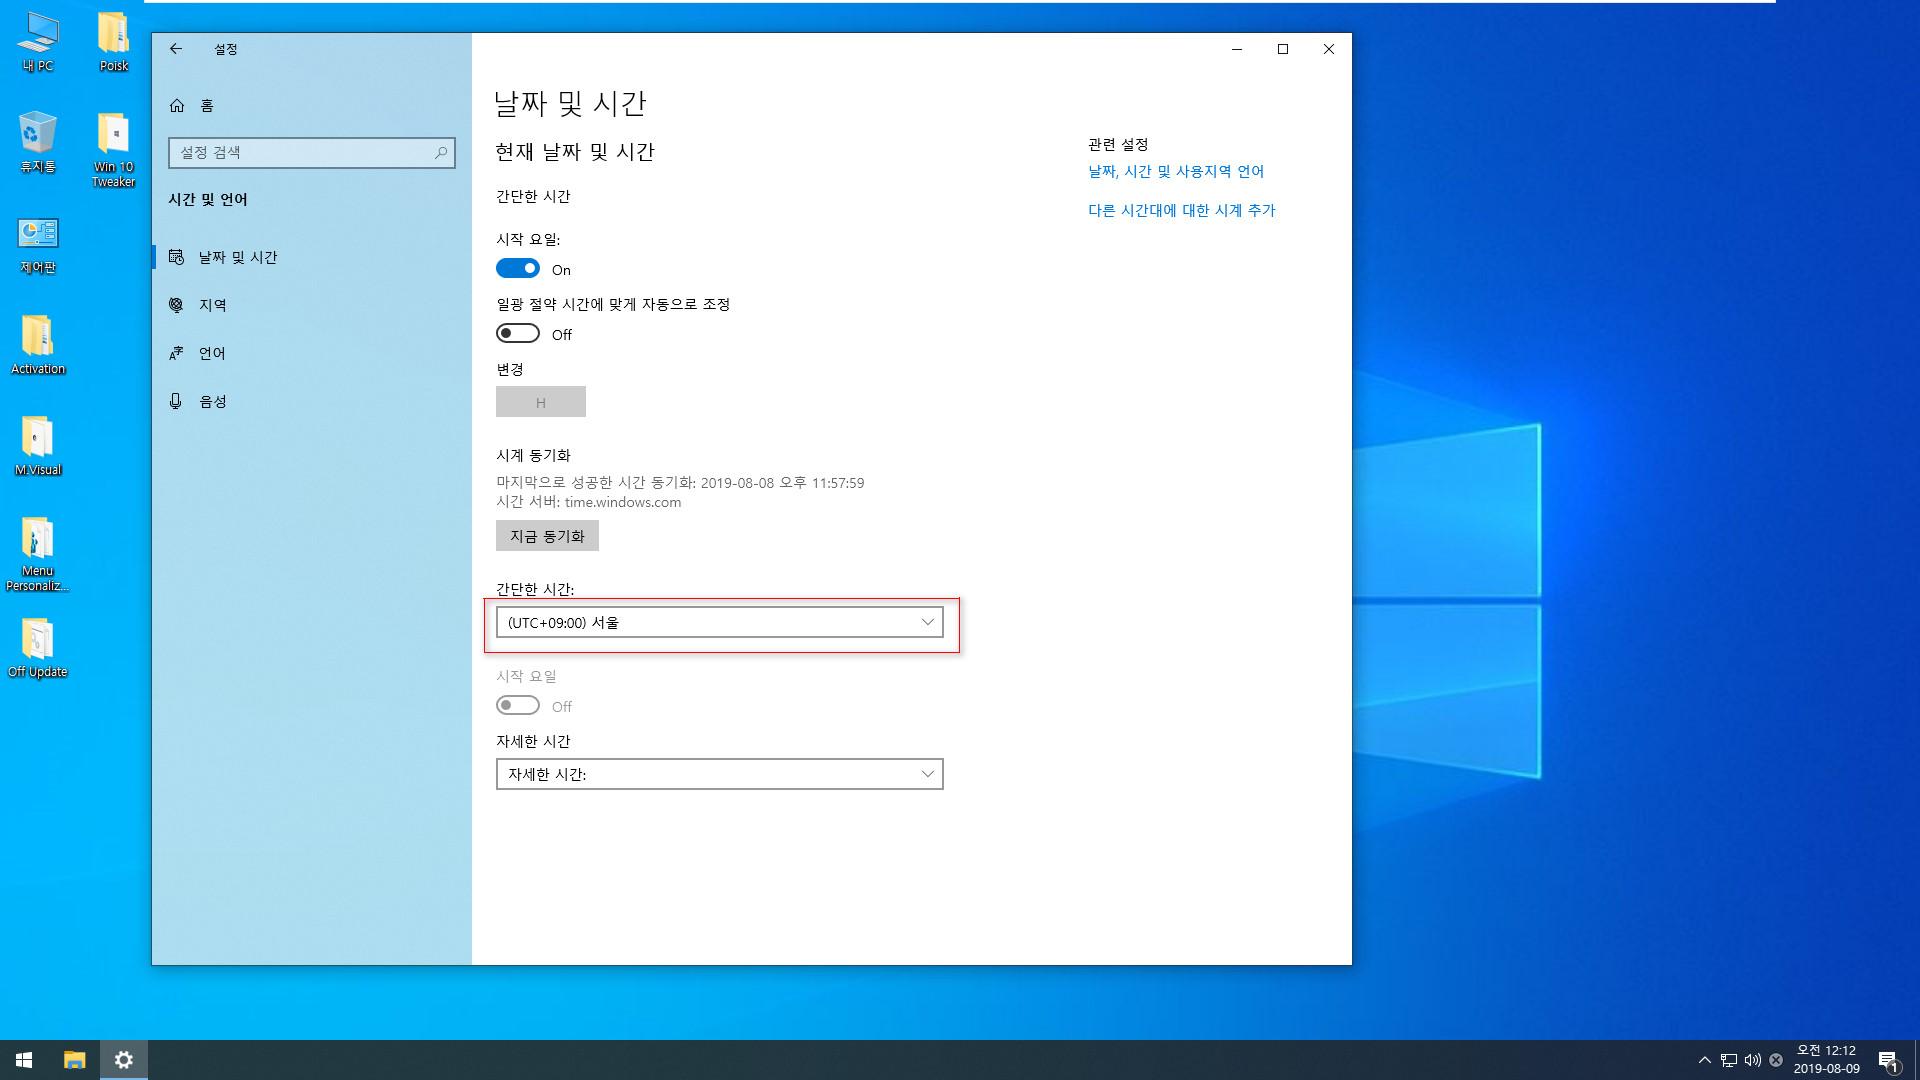 Windows 10 Enterprise x64 lite 1903 build 18362.267 by Zosma.iso - 러시아어 한글화 시도 - 그래서 그냥 원본대로 설치 후에 한글화 시도 2019-08-09_001232.jpg